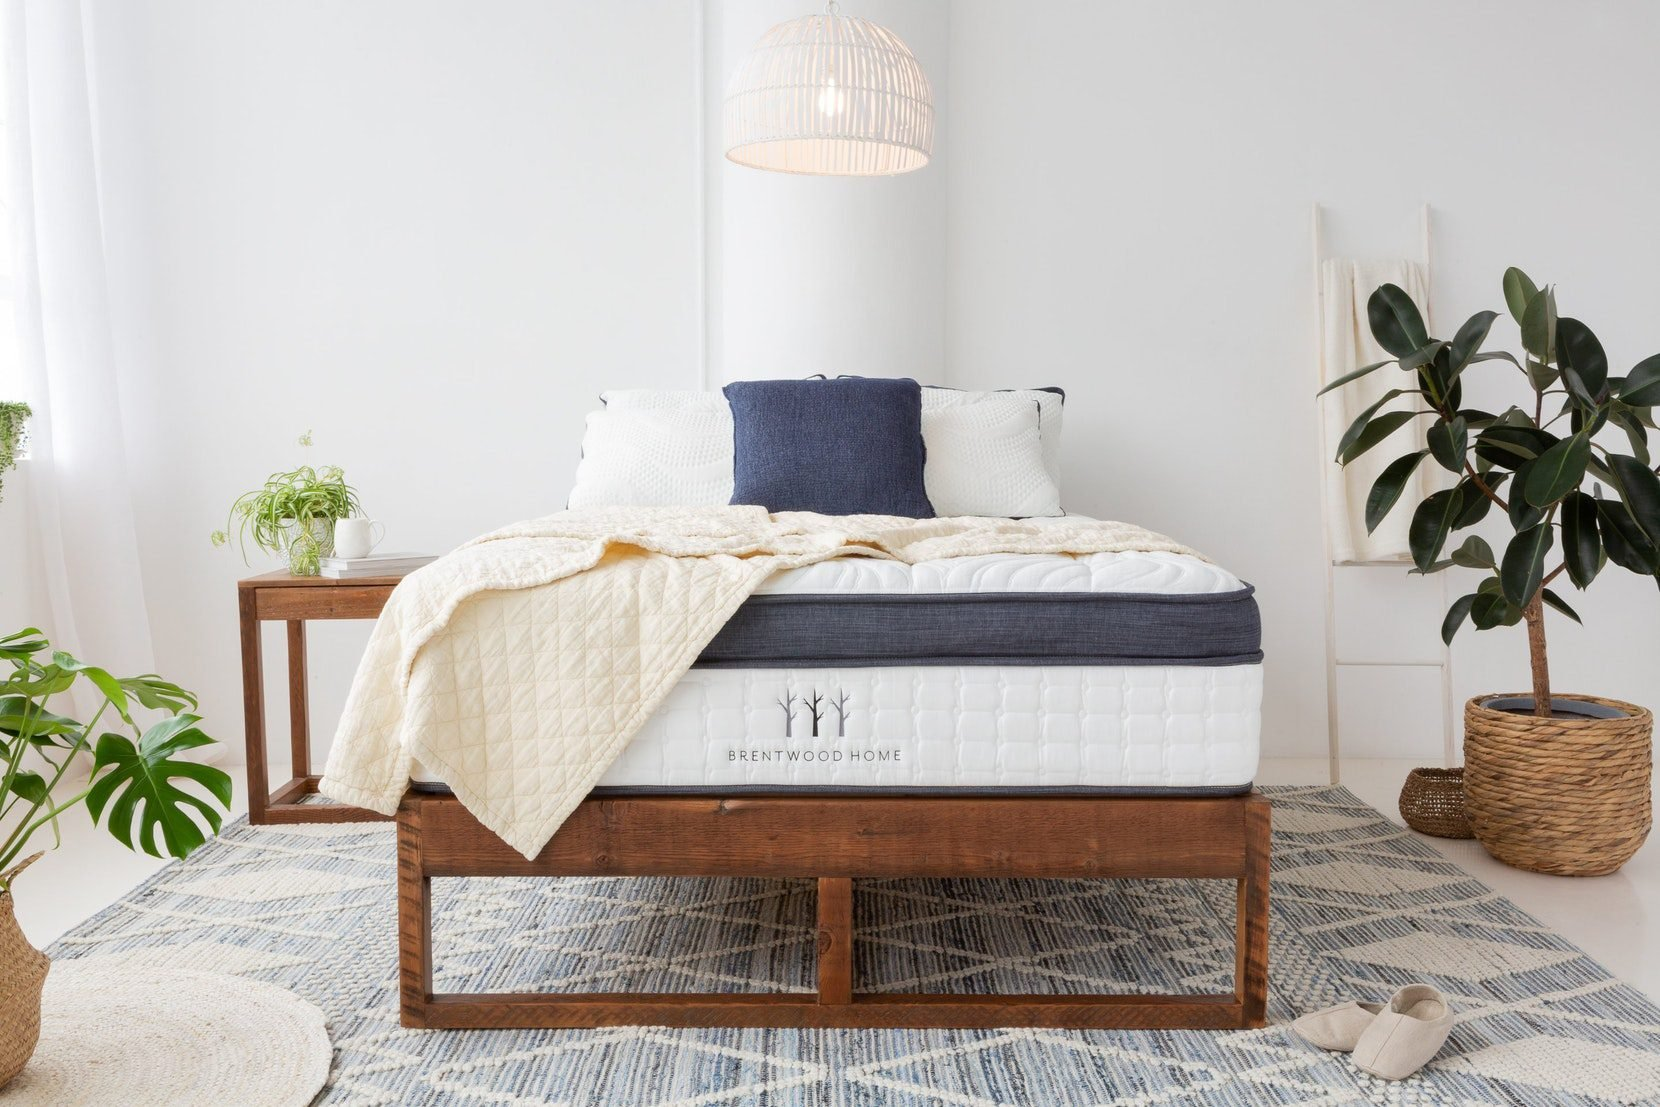 Brentwood Home Oceano Luxury Hybrid Mattress